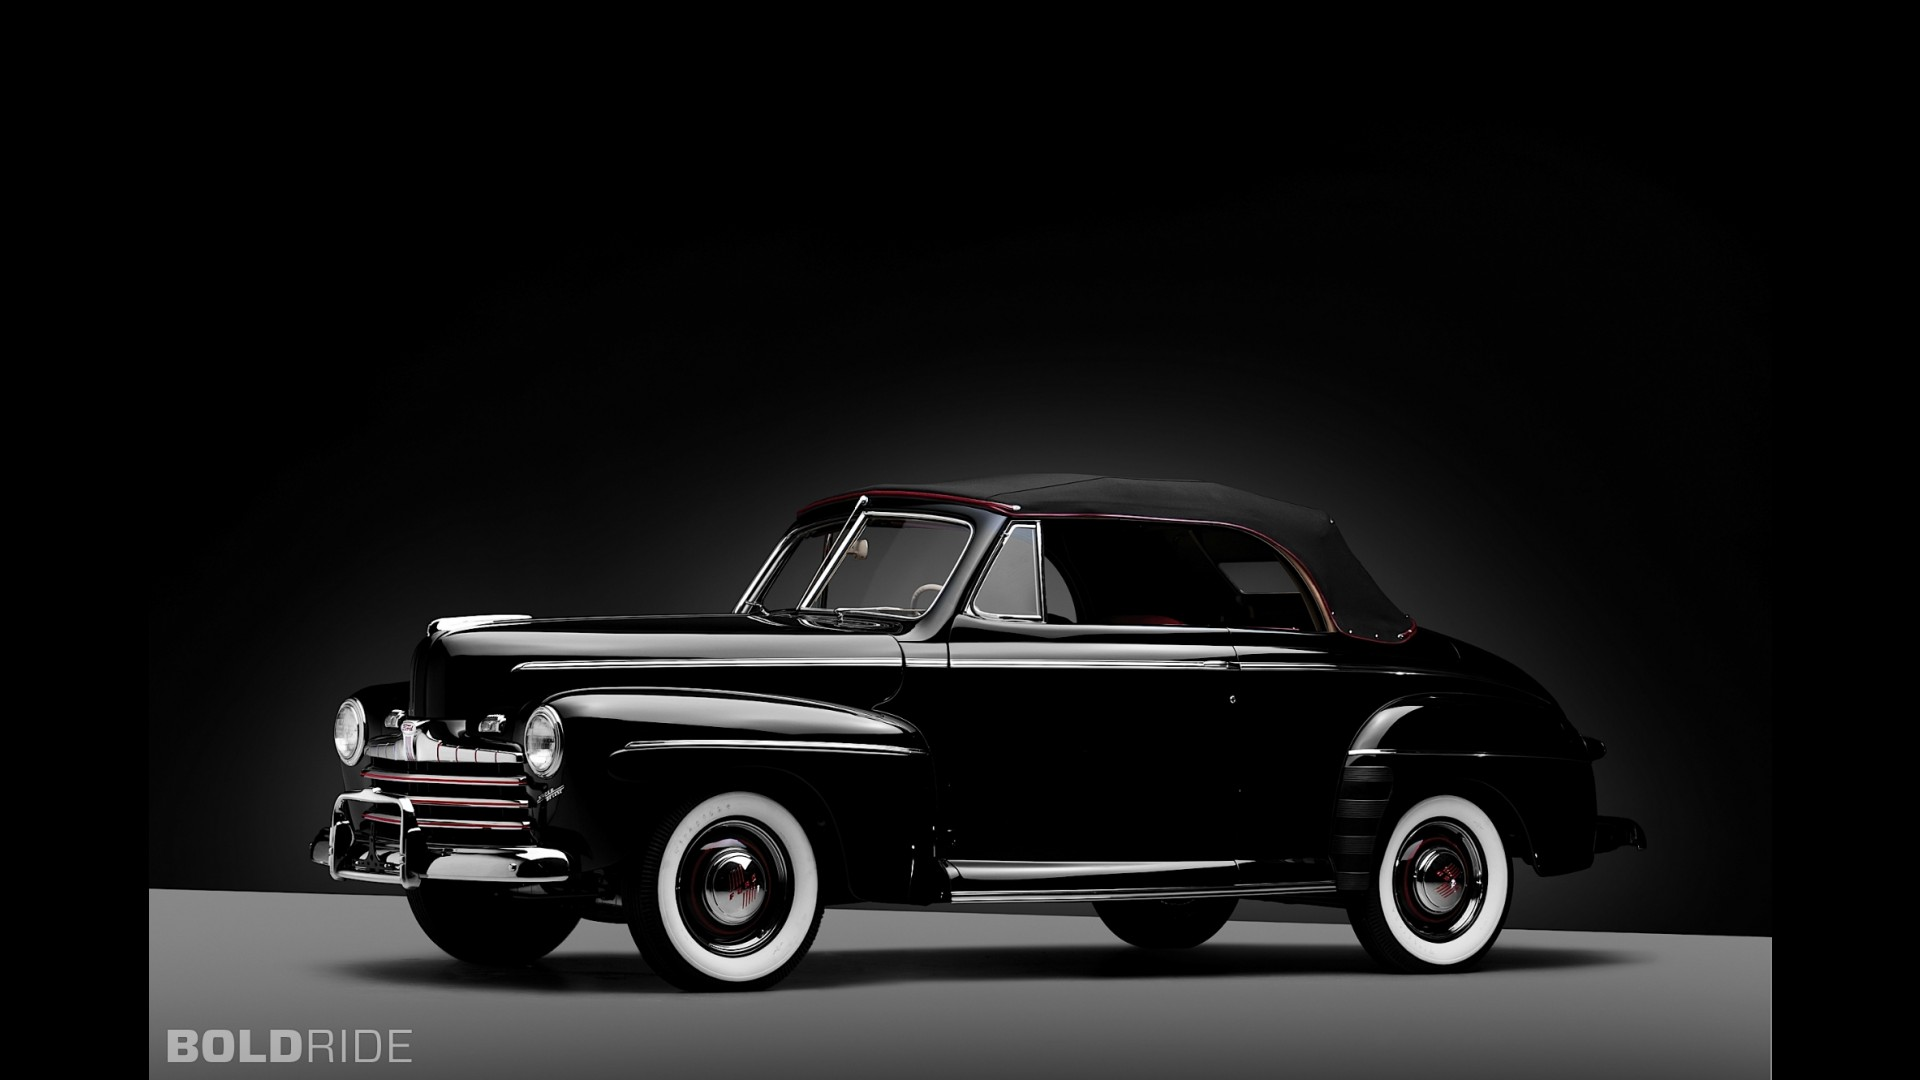 форд 46 года кабриолет характеристики